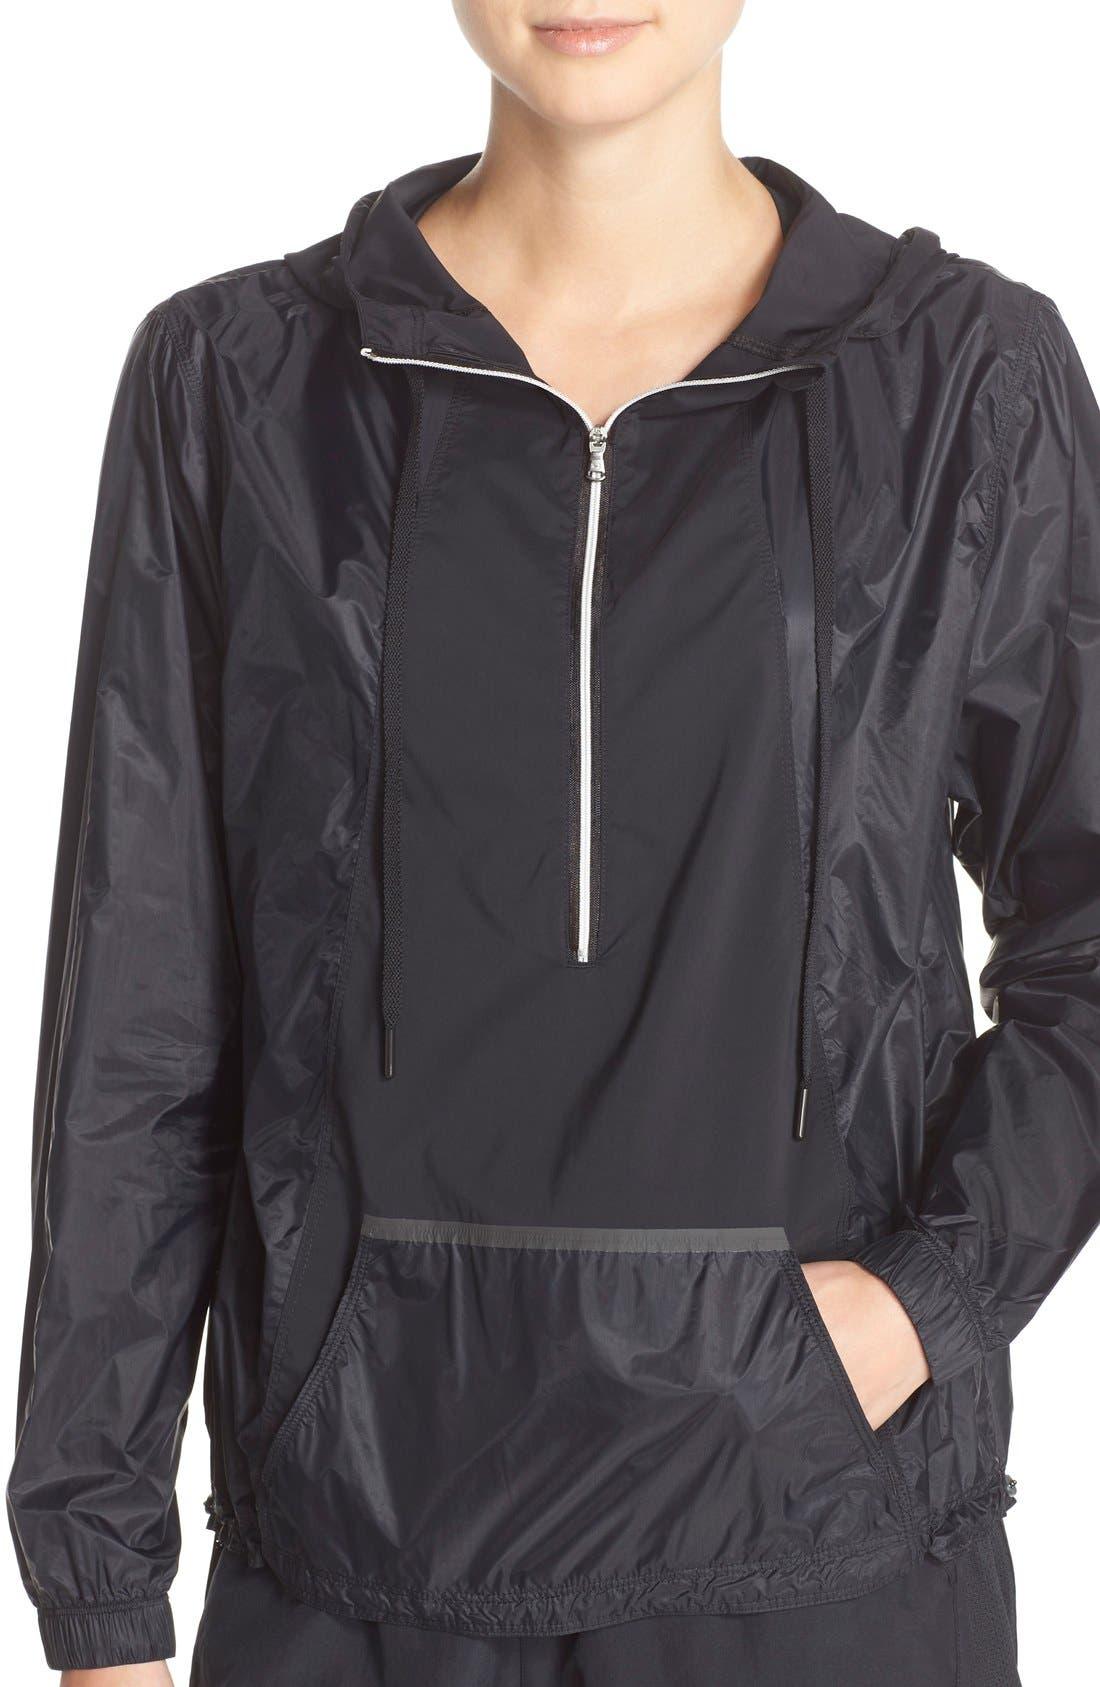 Alternate Image 4  - Under Armour 'Roga' Half Zip Jacket